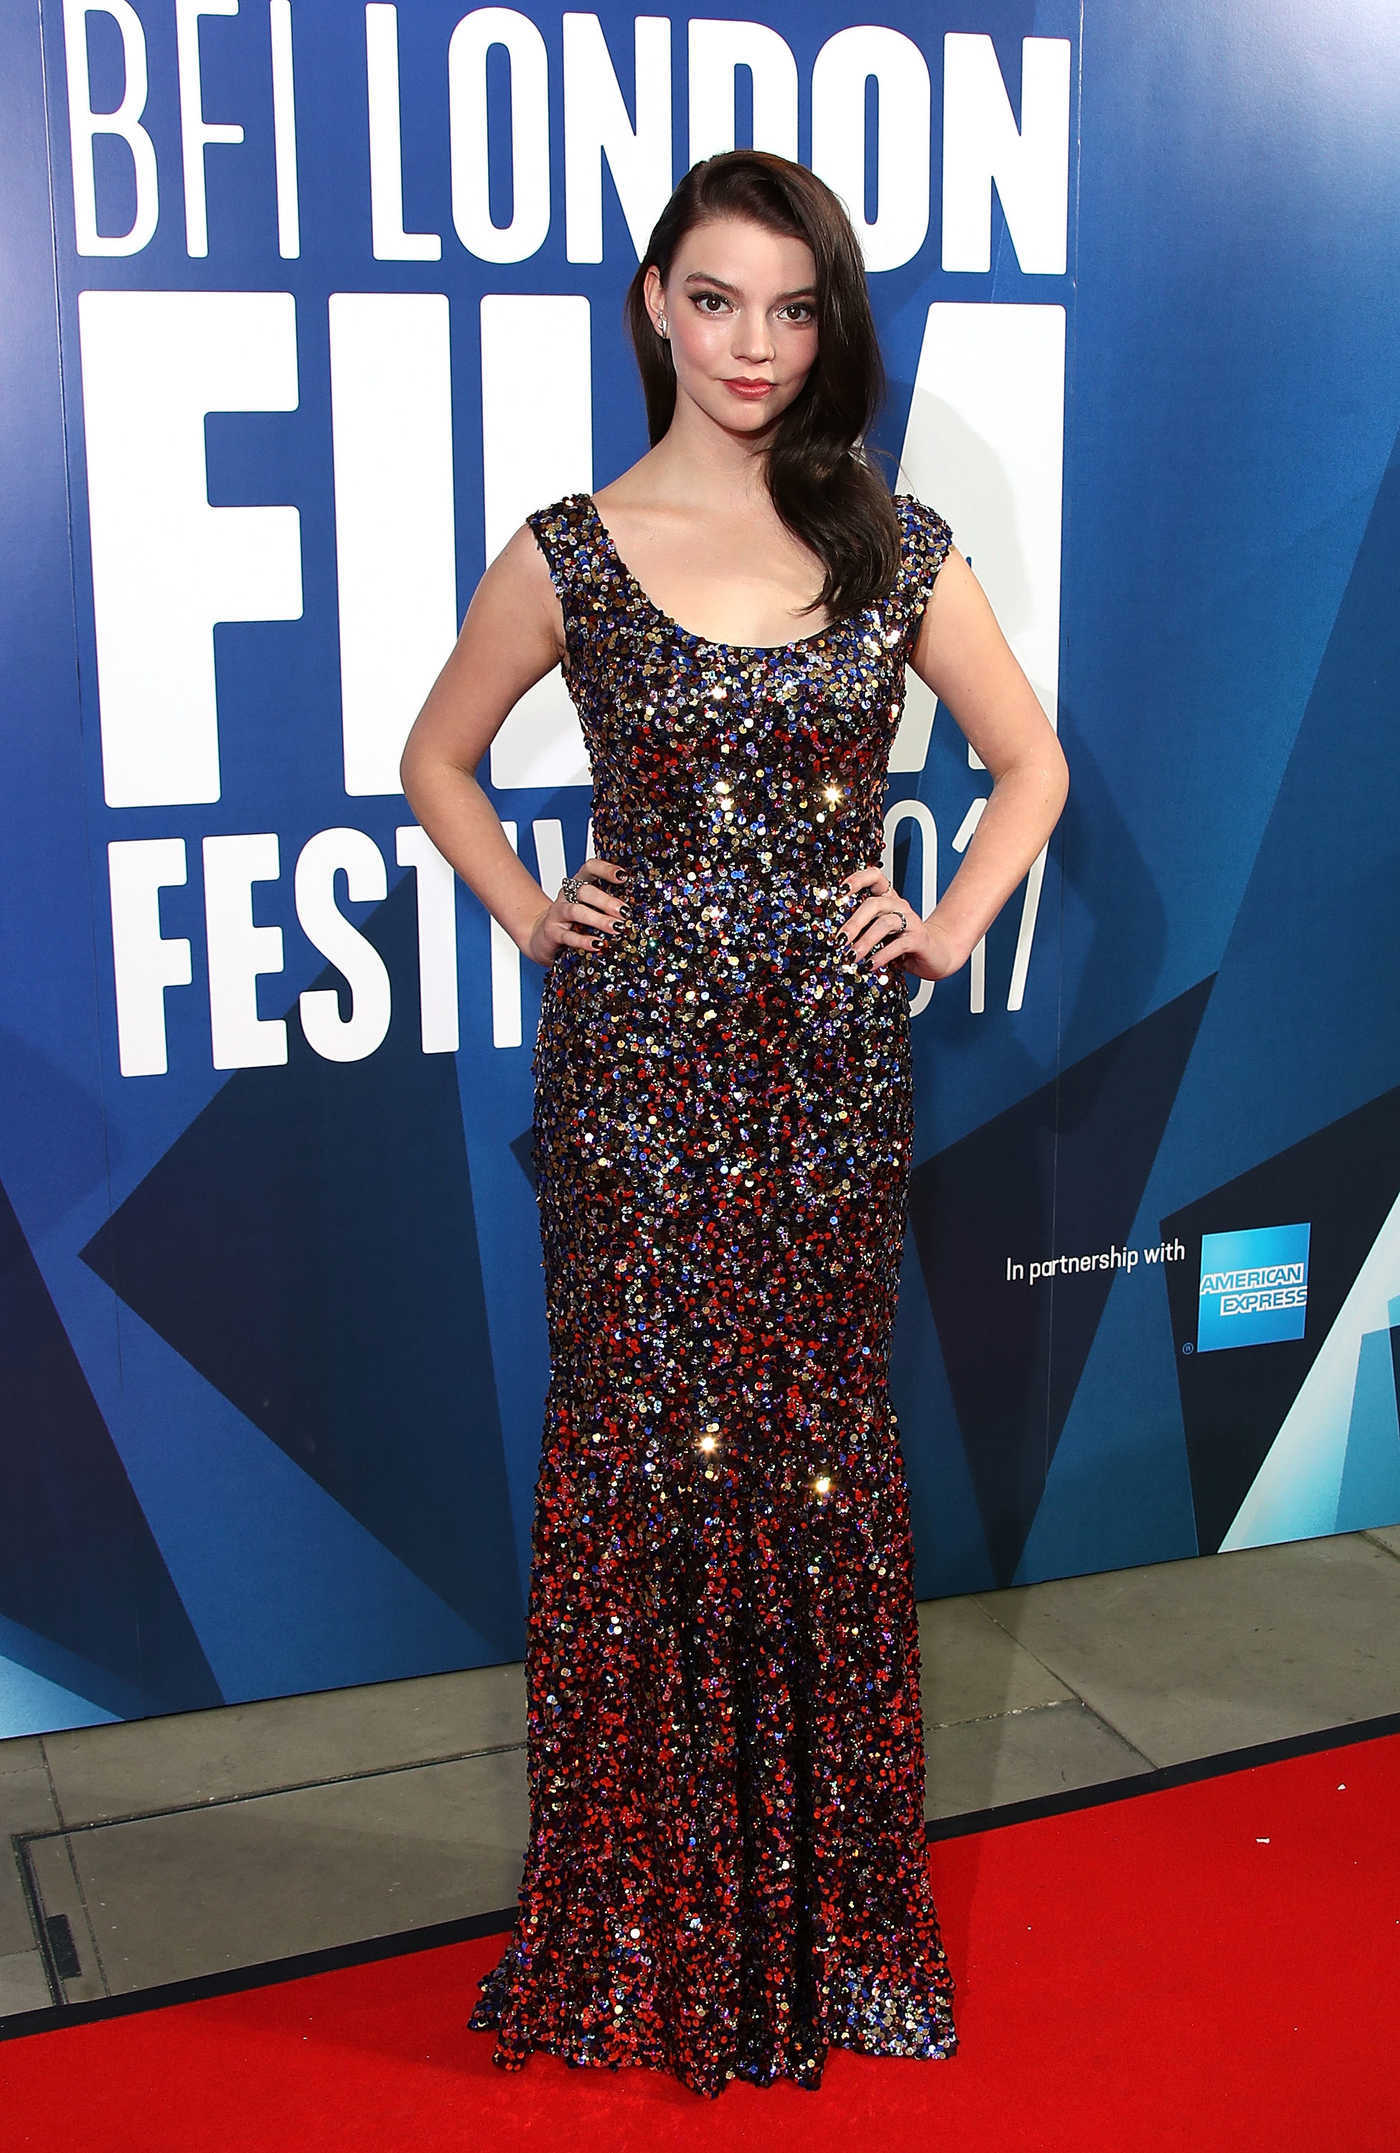 Anya Taylor-Joy at the 61st BFI London Film Festival Awards 10/14/2017